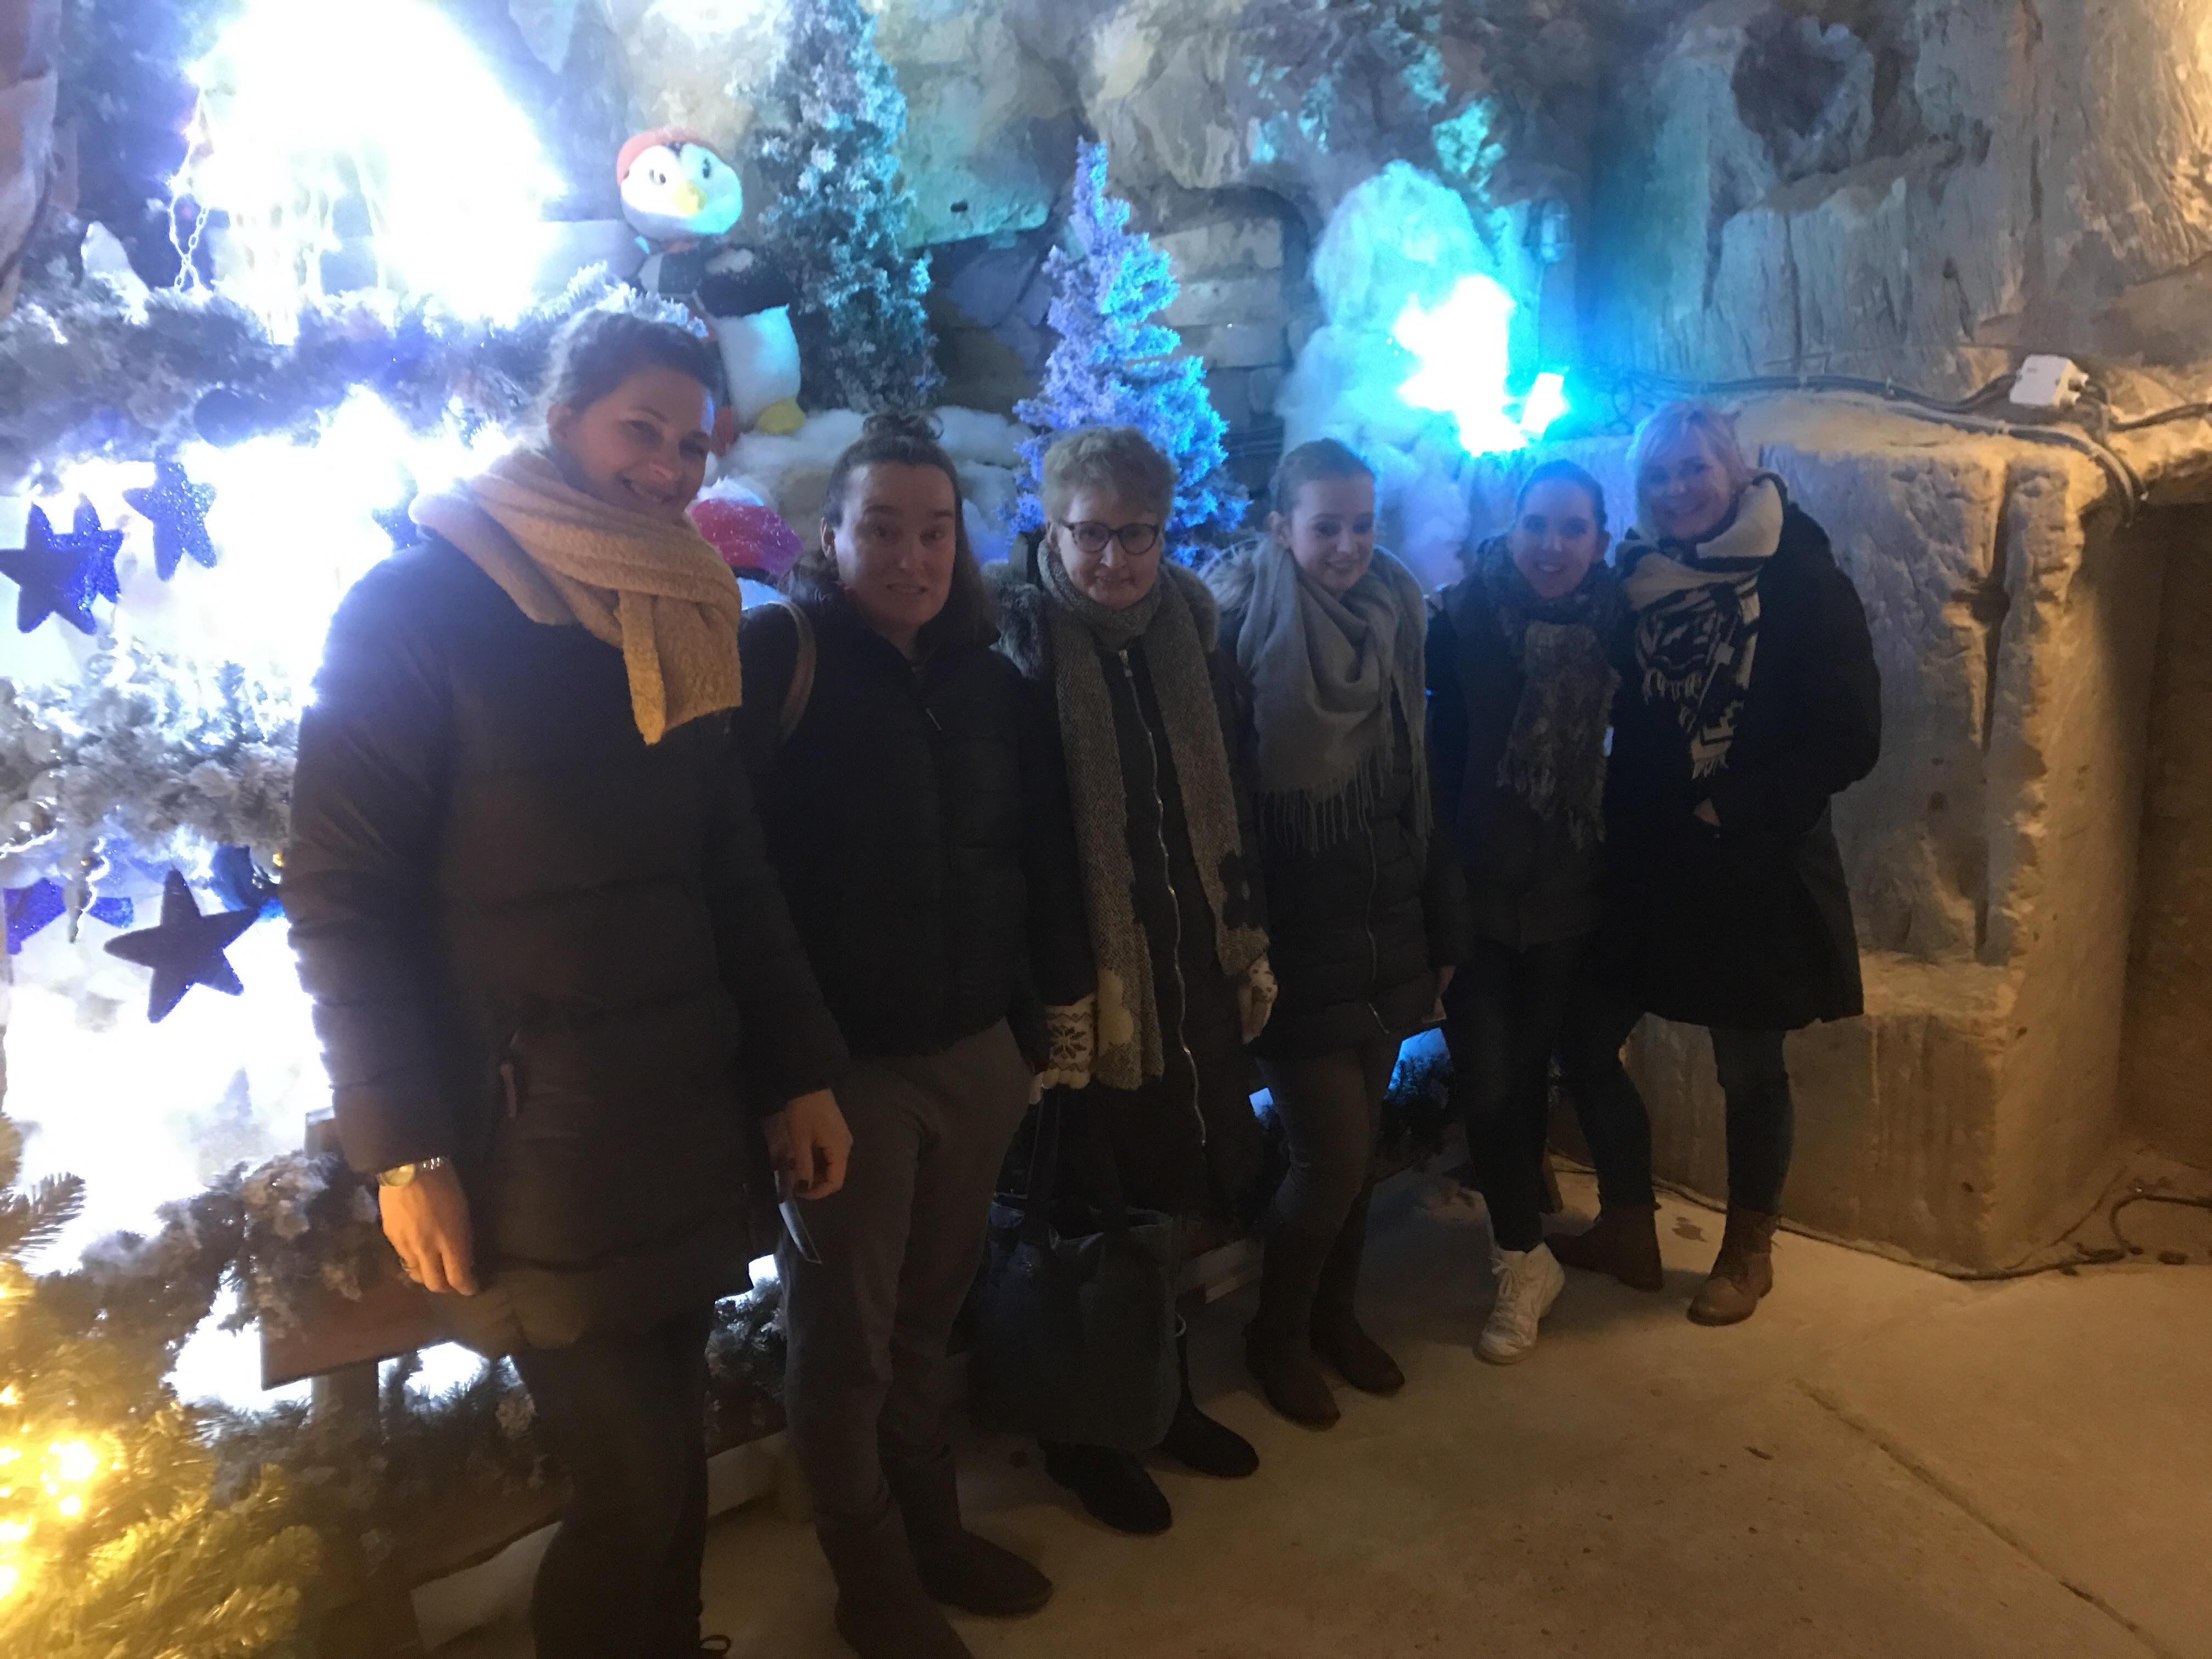 Groepsfoto Fluweelgrot Valkenburg december 2018